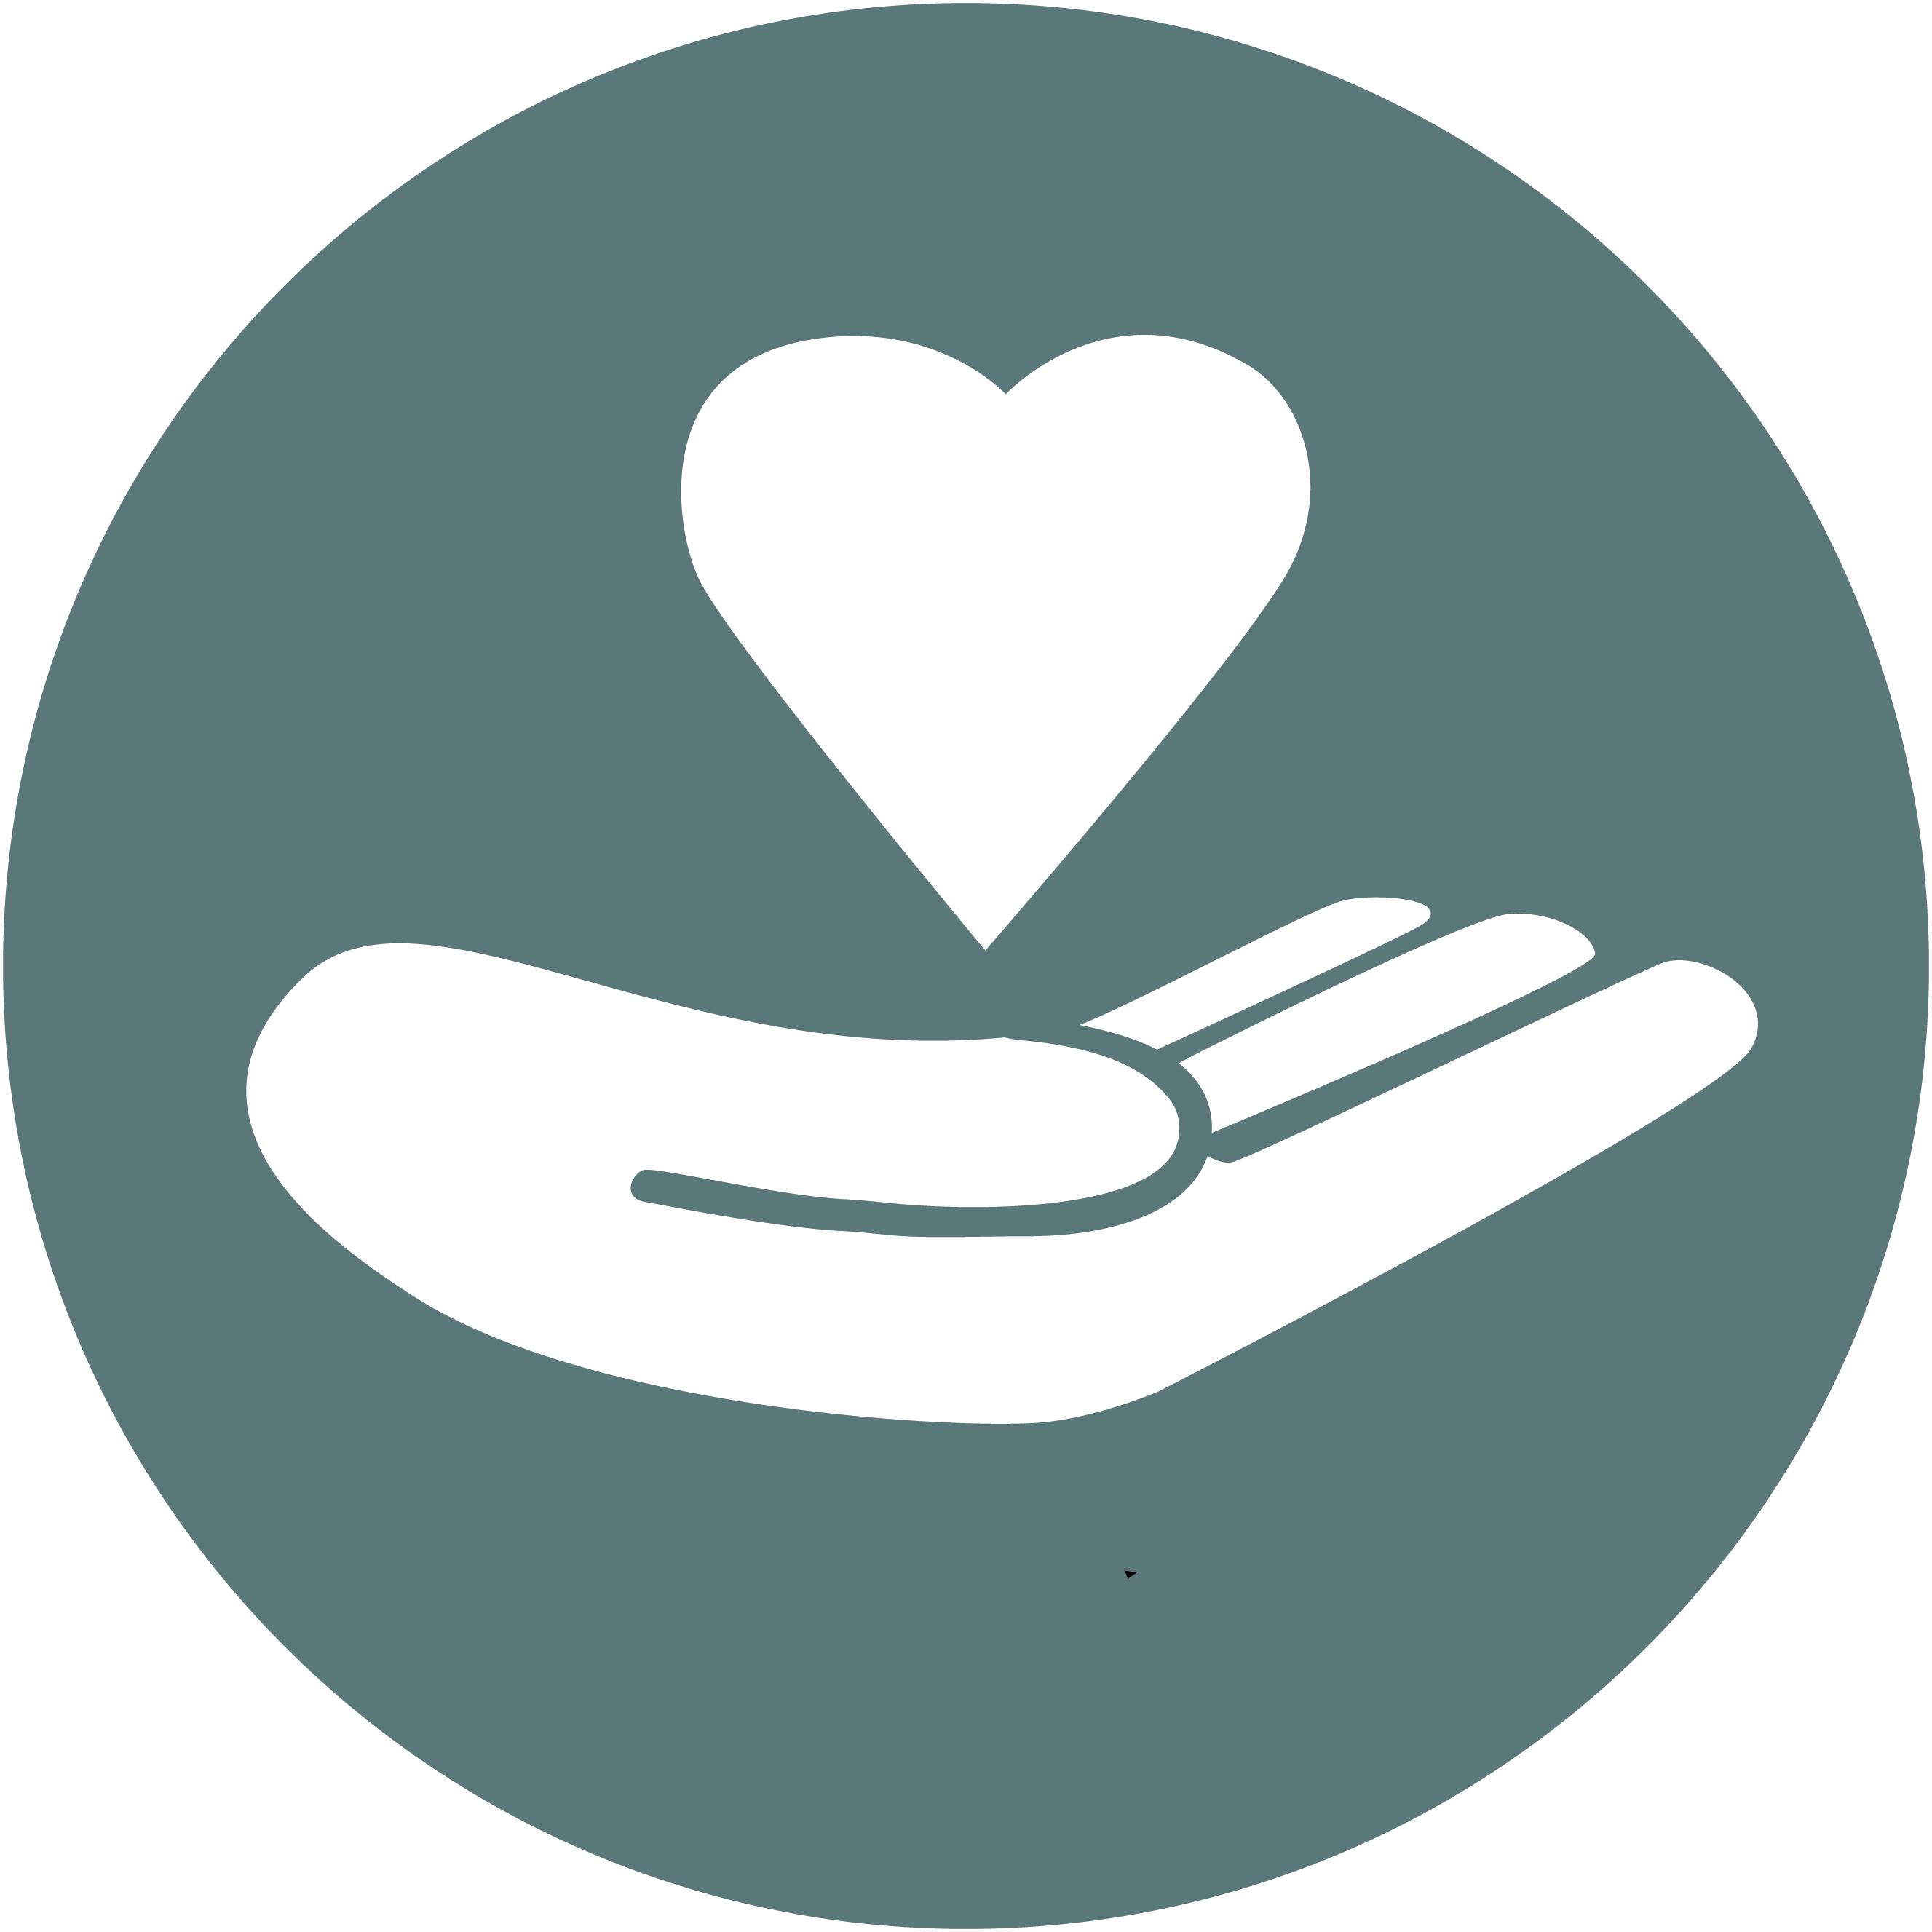 Giving Symbol